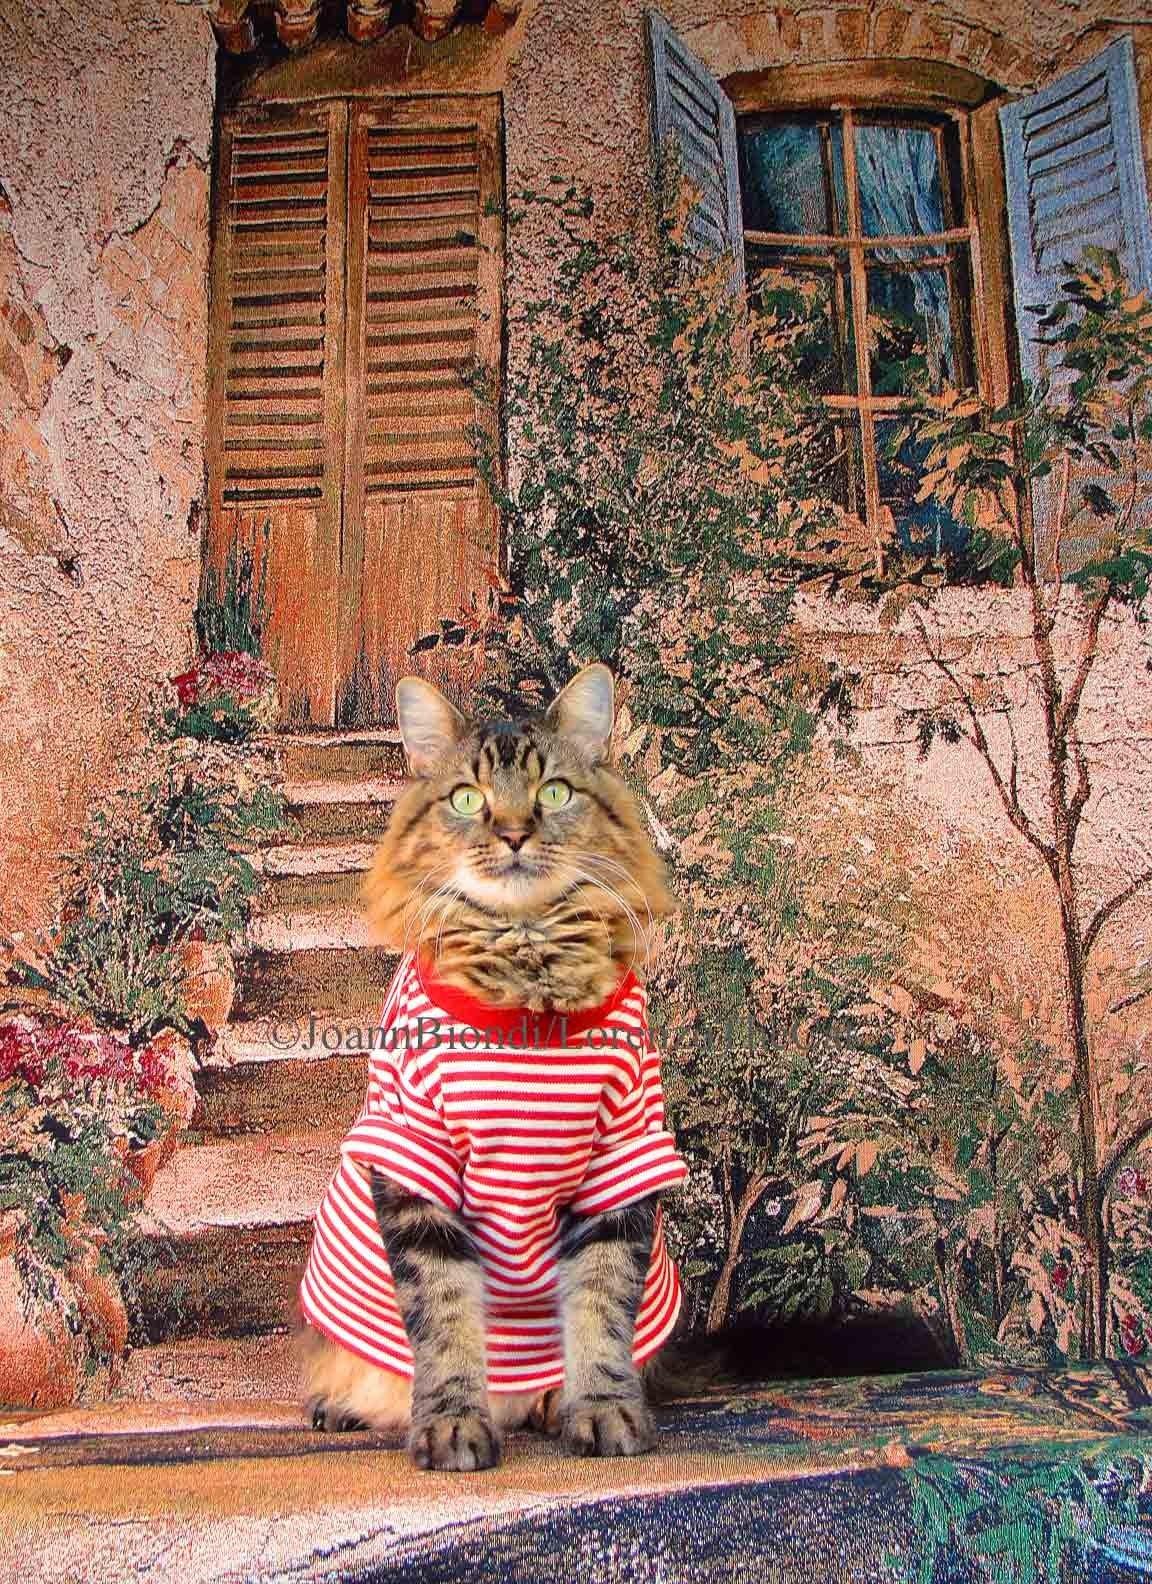 Tuscany 5 x 7 print